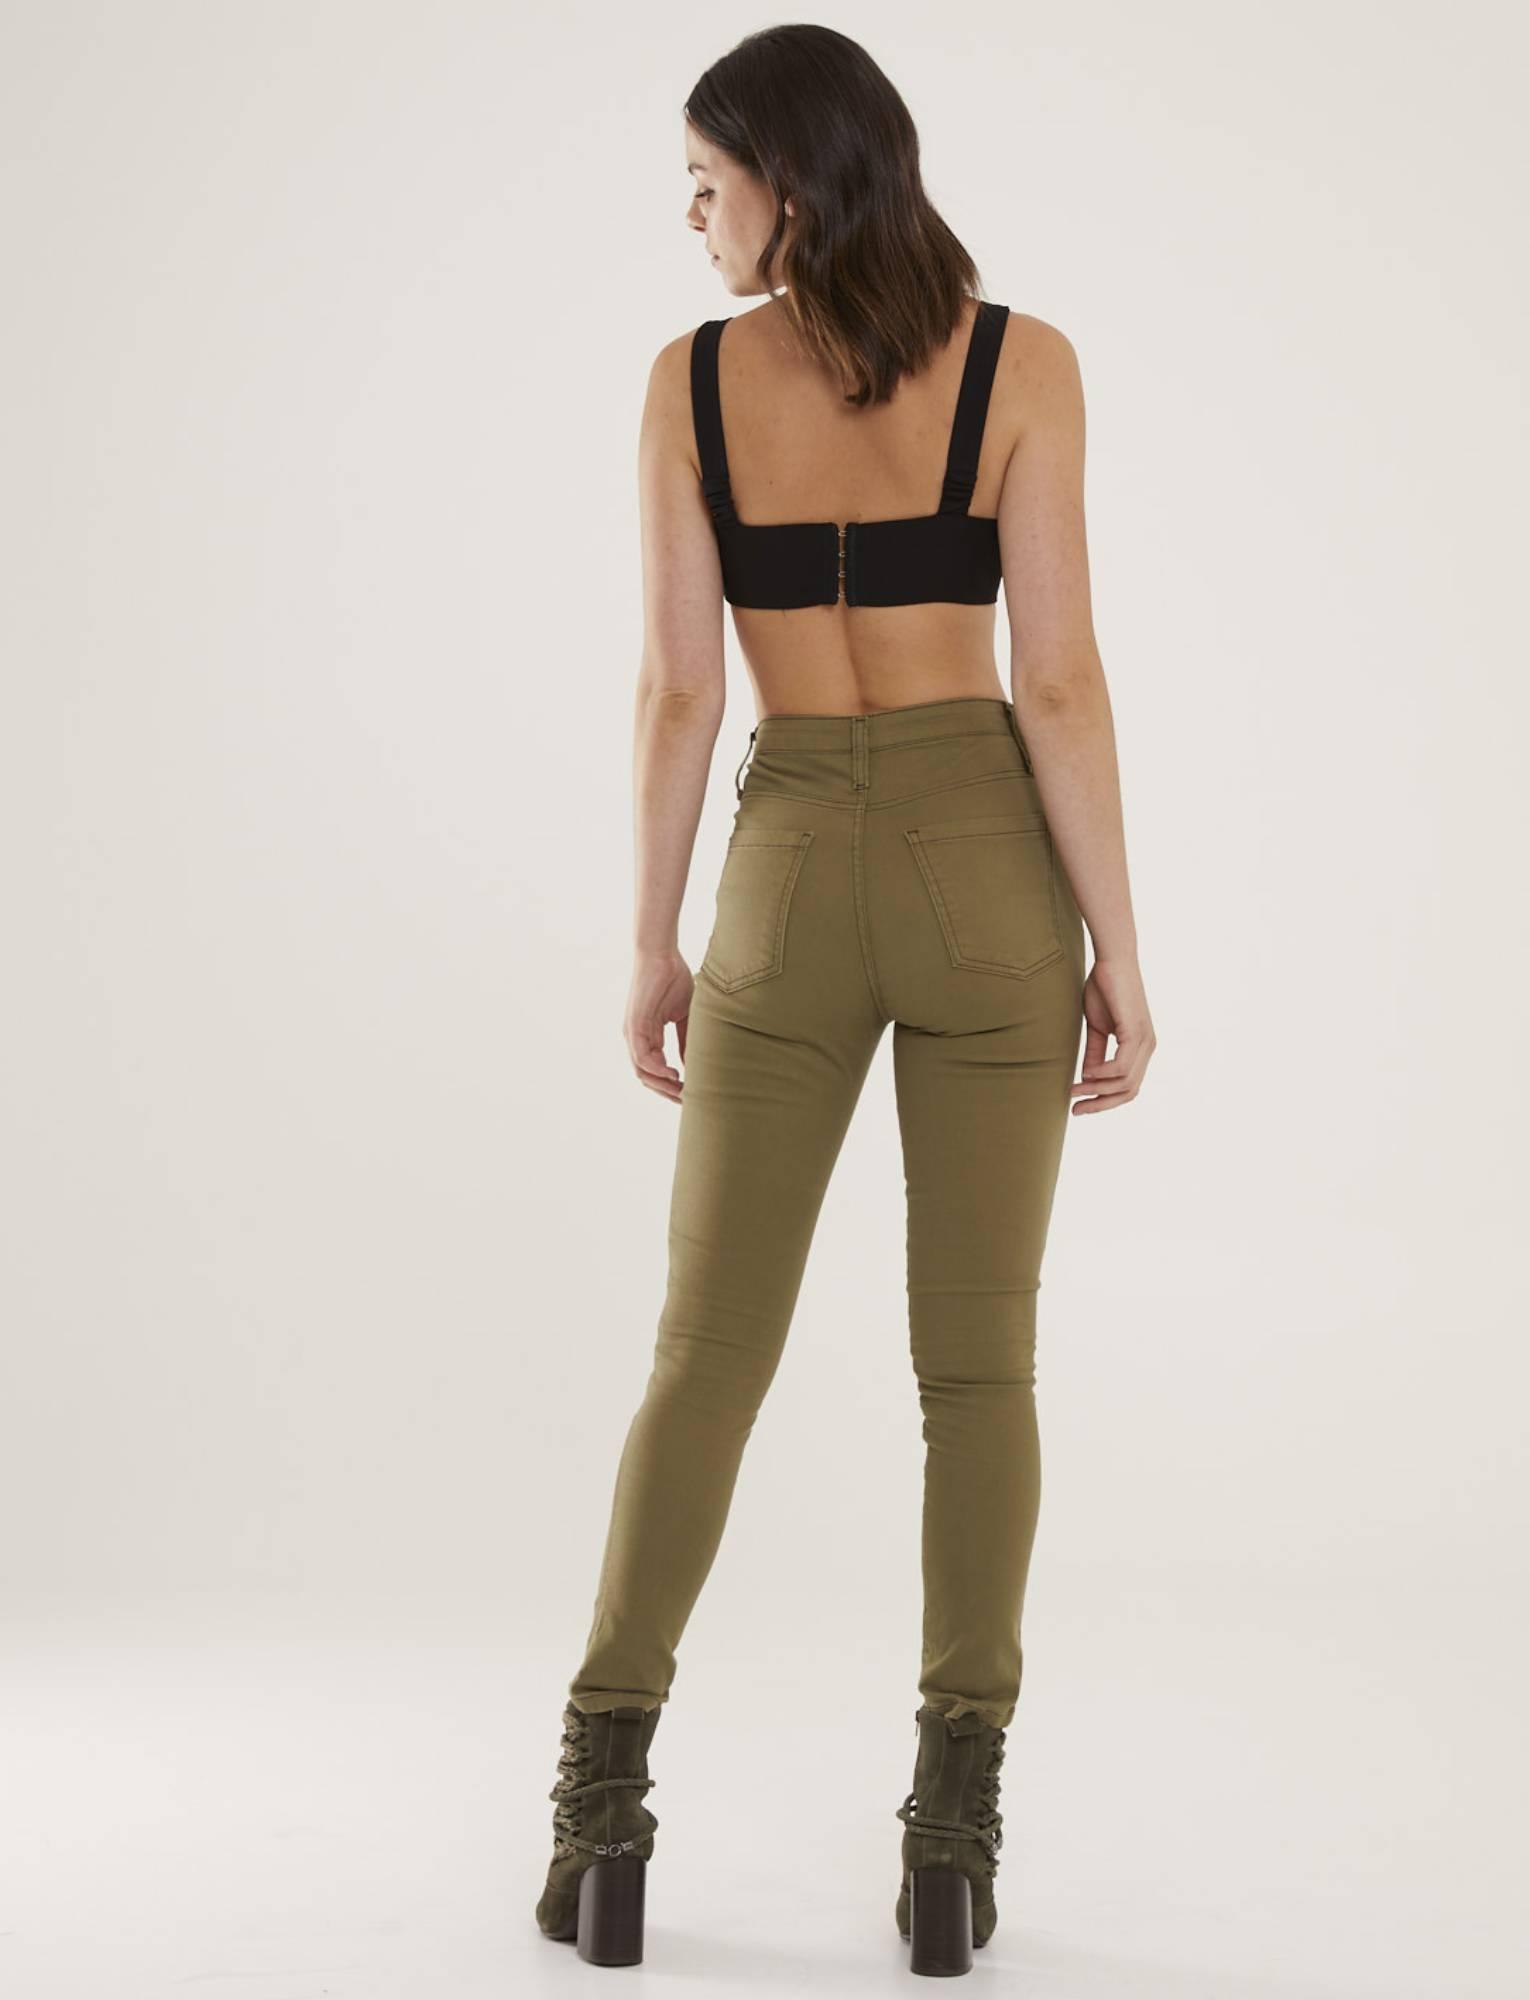 Calça Jeans Militar Feminina Skinny Lisa